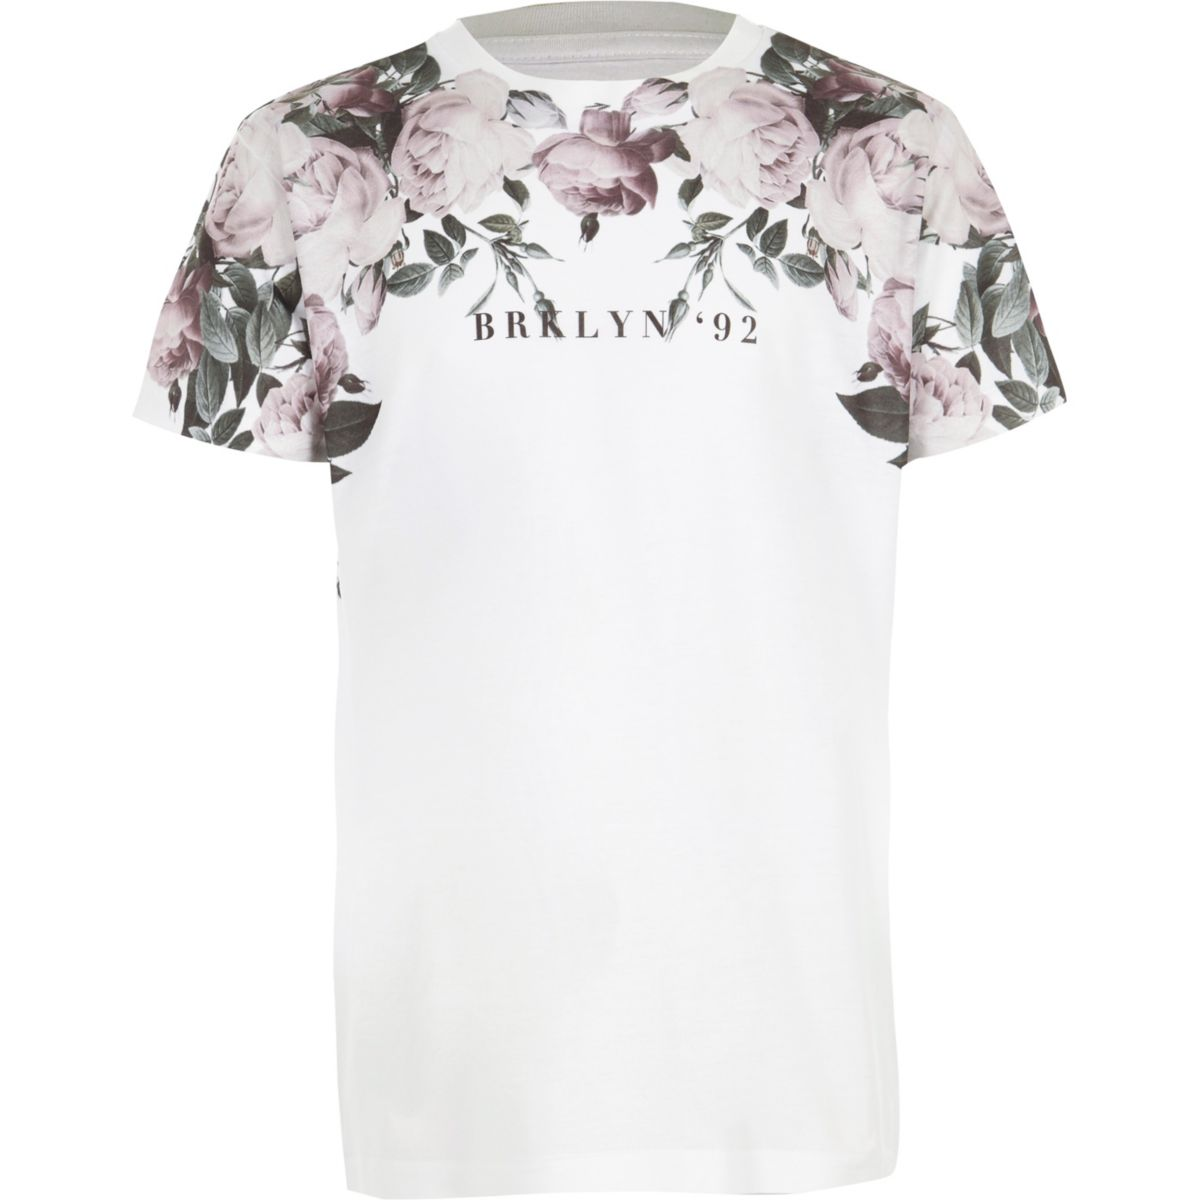 Boys white floral 39 brooklyn 39 print t shirt t shirts t for T shirt printing brooklyn